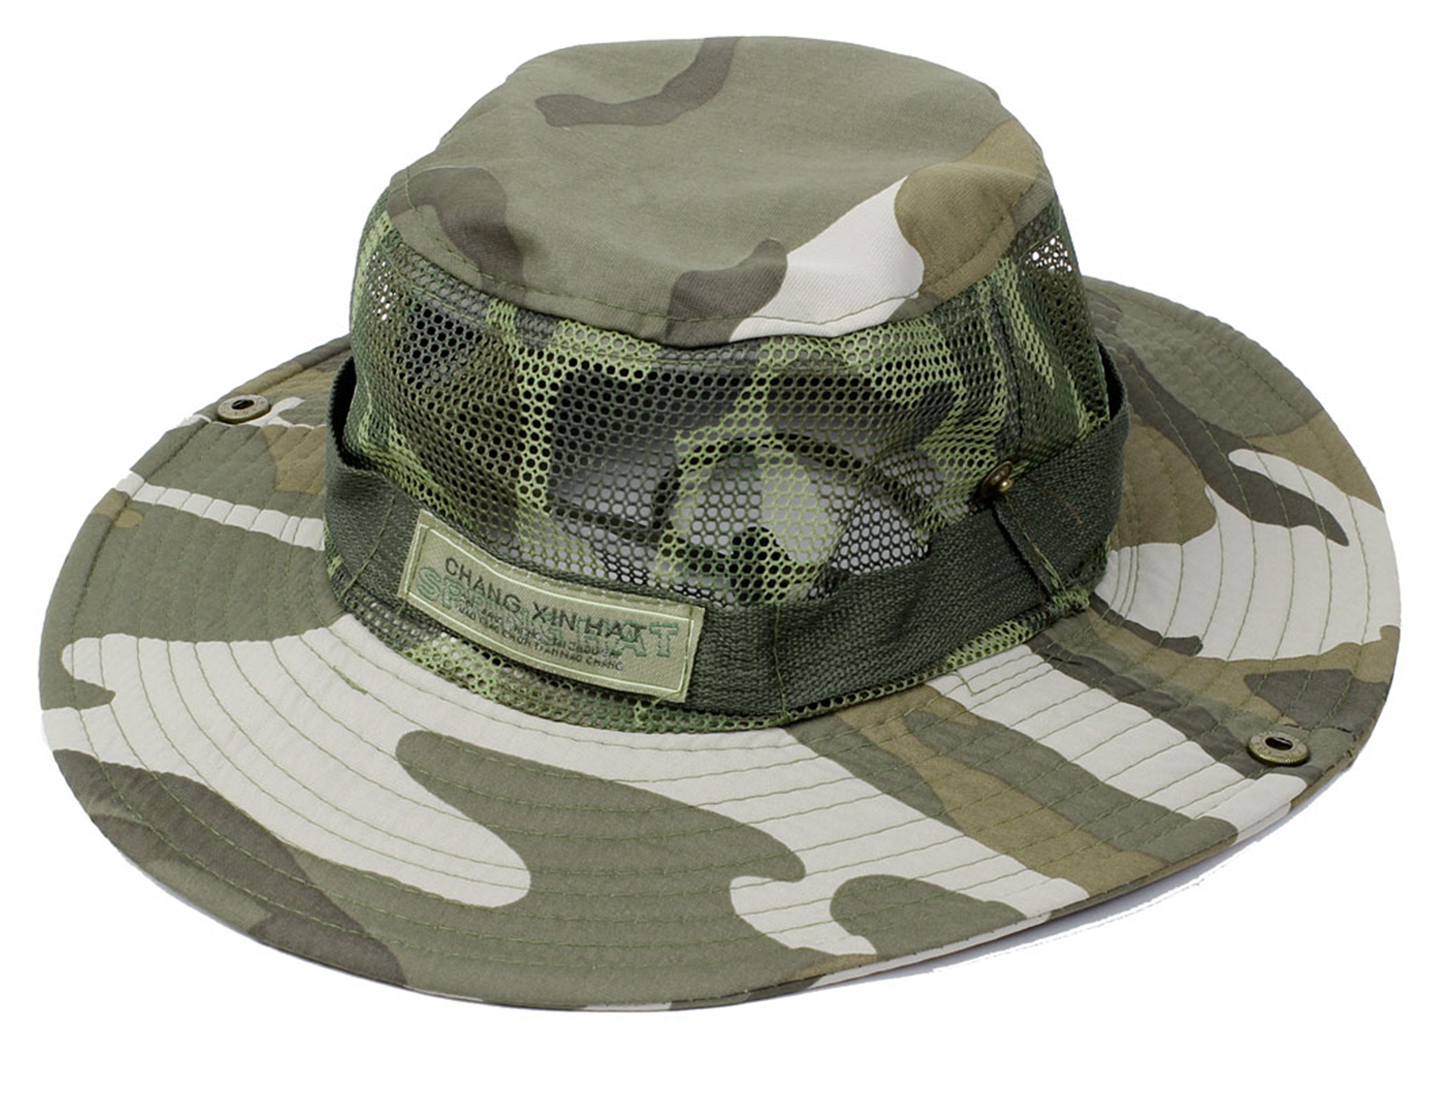 Man Mesh Design Top Camouflage Pattern Fishing Sun Shield Hat Cap